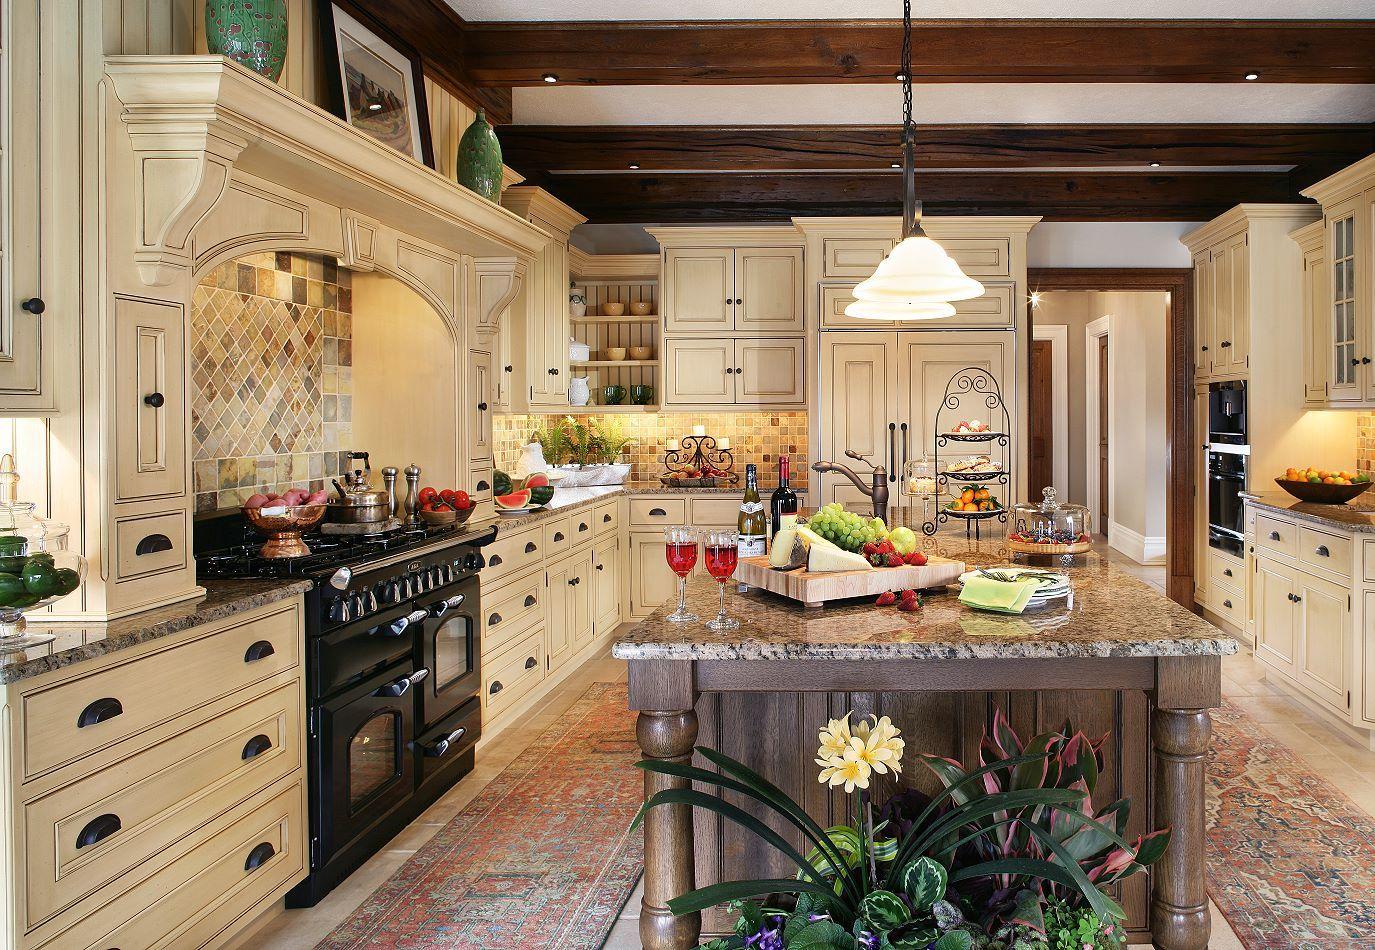 best images about kitchen designs on pinterest custom custom eat in kitchen designs - Custom Kitchen Design Ideas